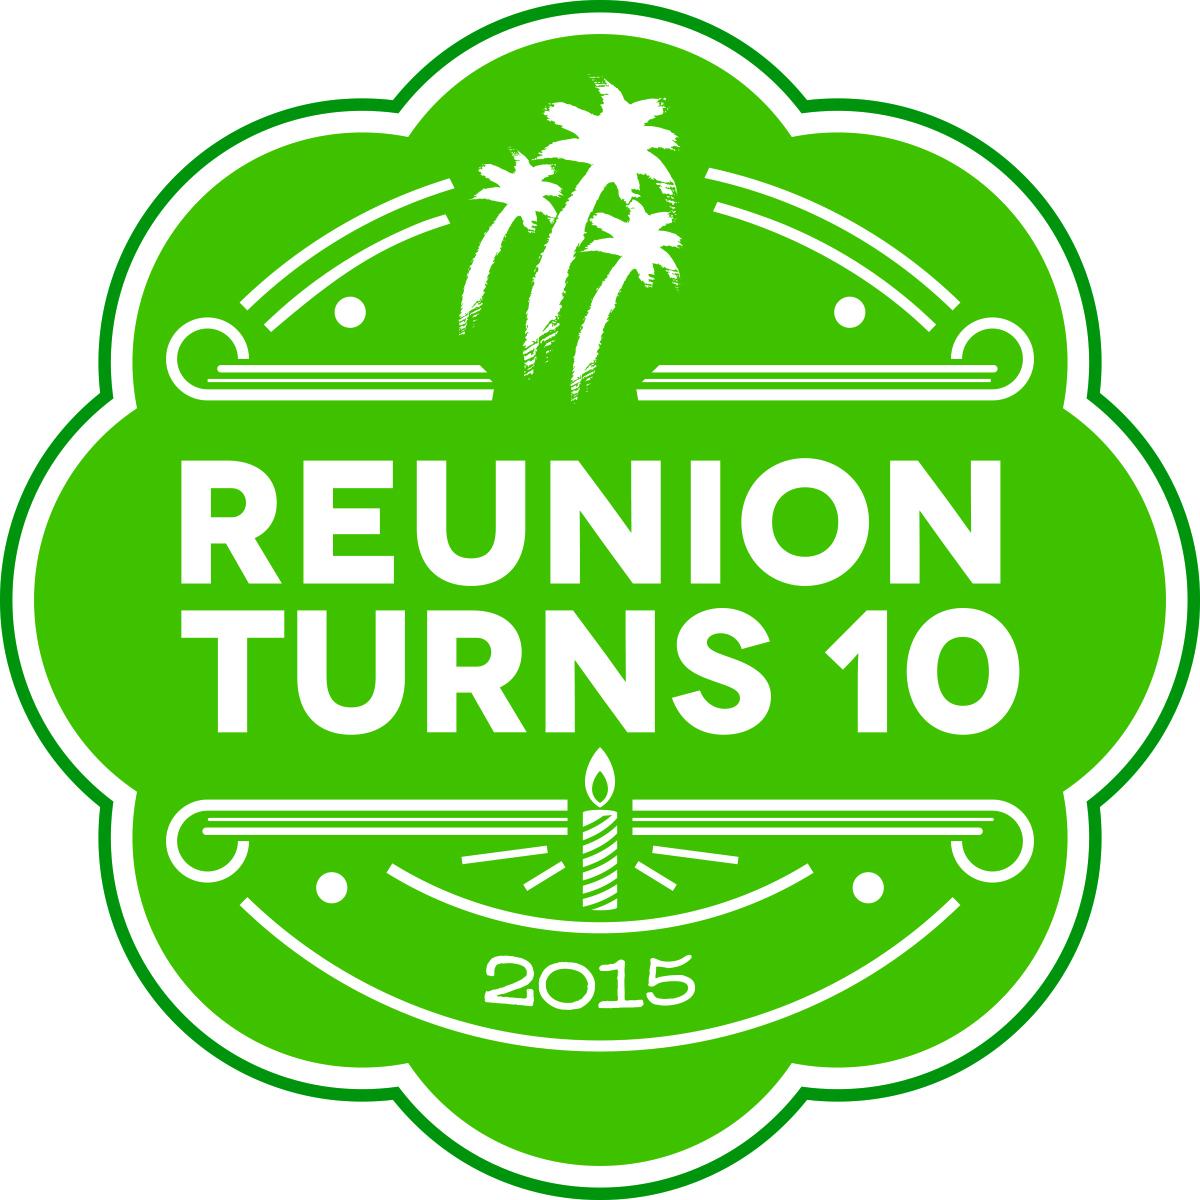 Time to celebrate: Reunion Resort Turns 10